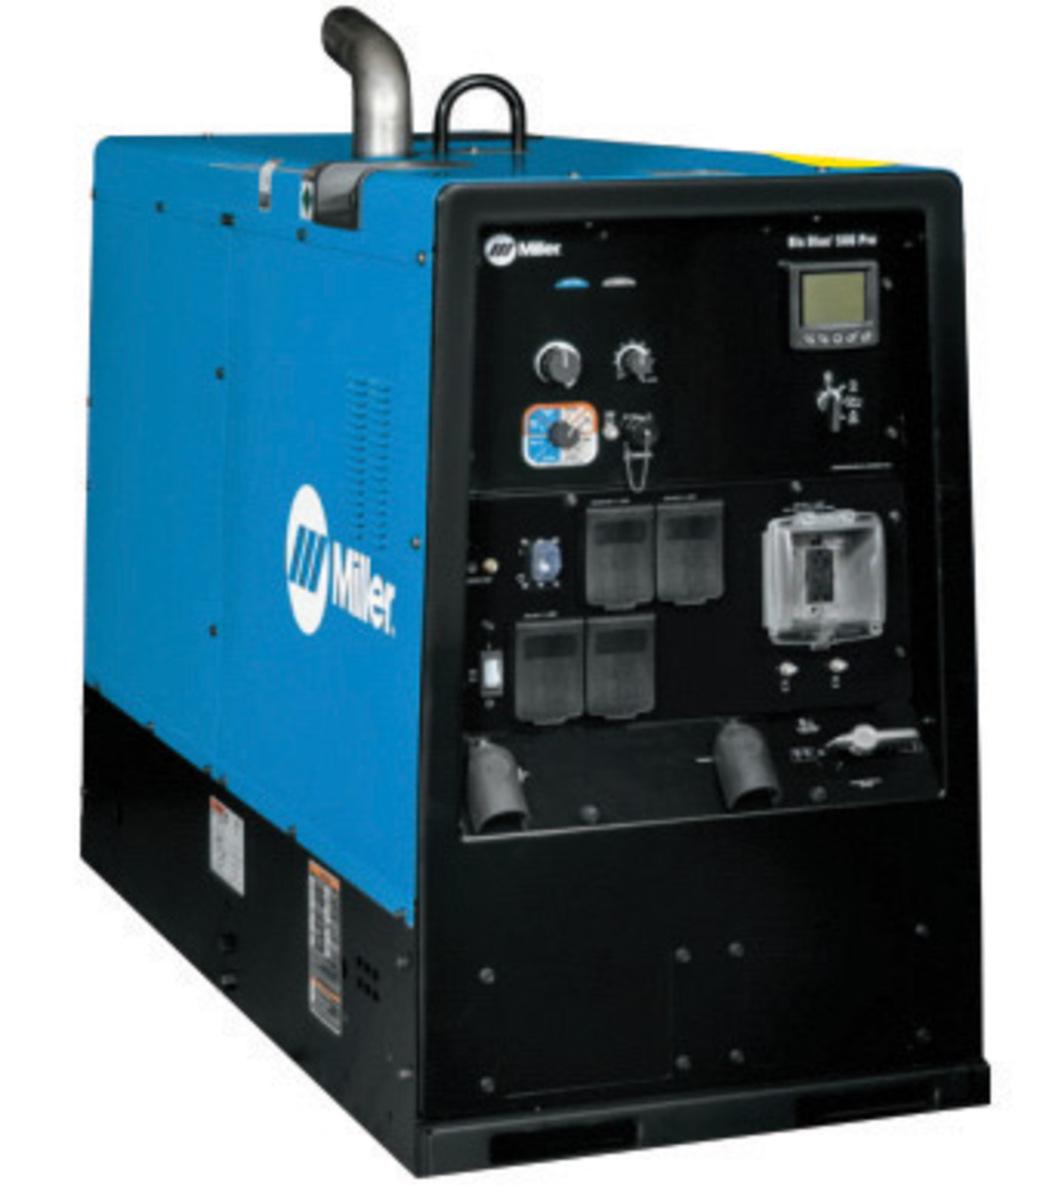 miller-welding-machine-big-blue-500x.jpg